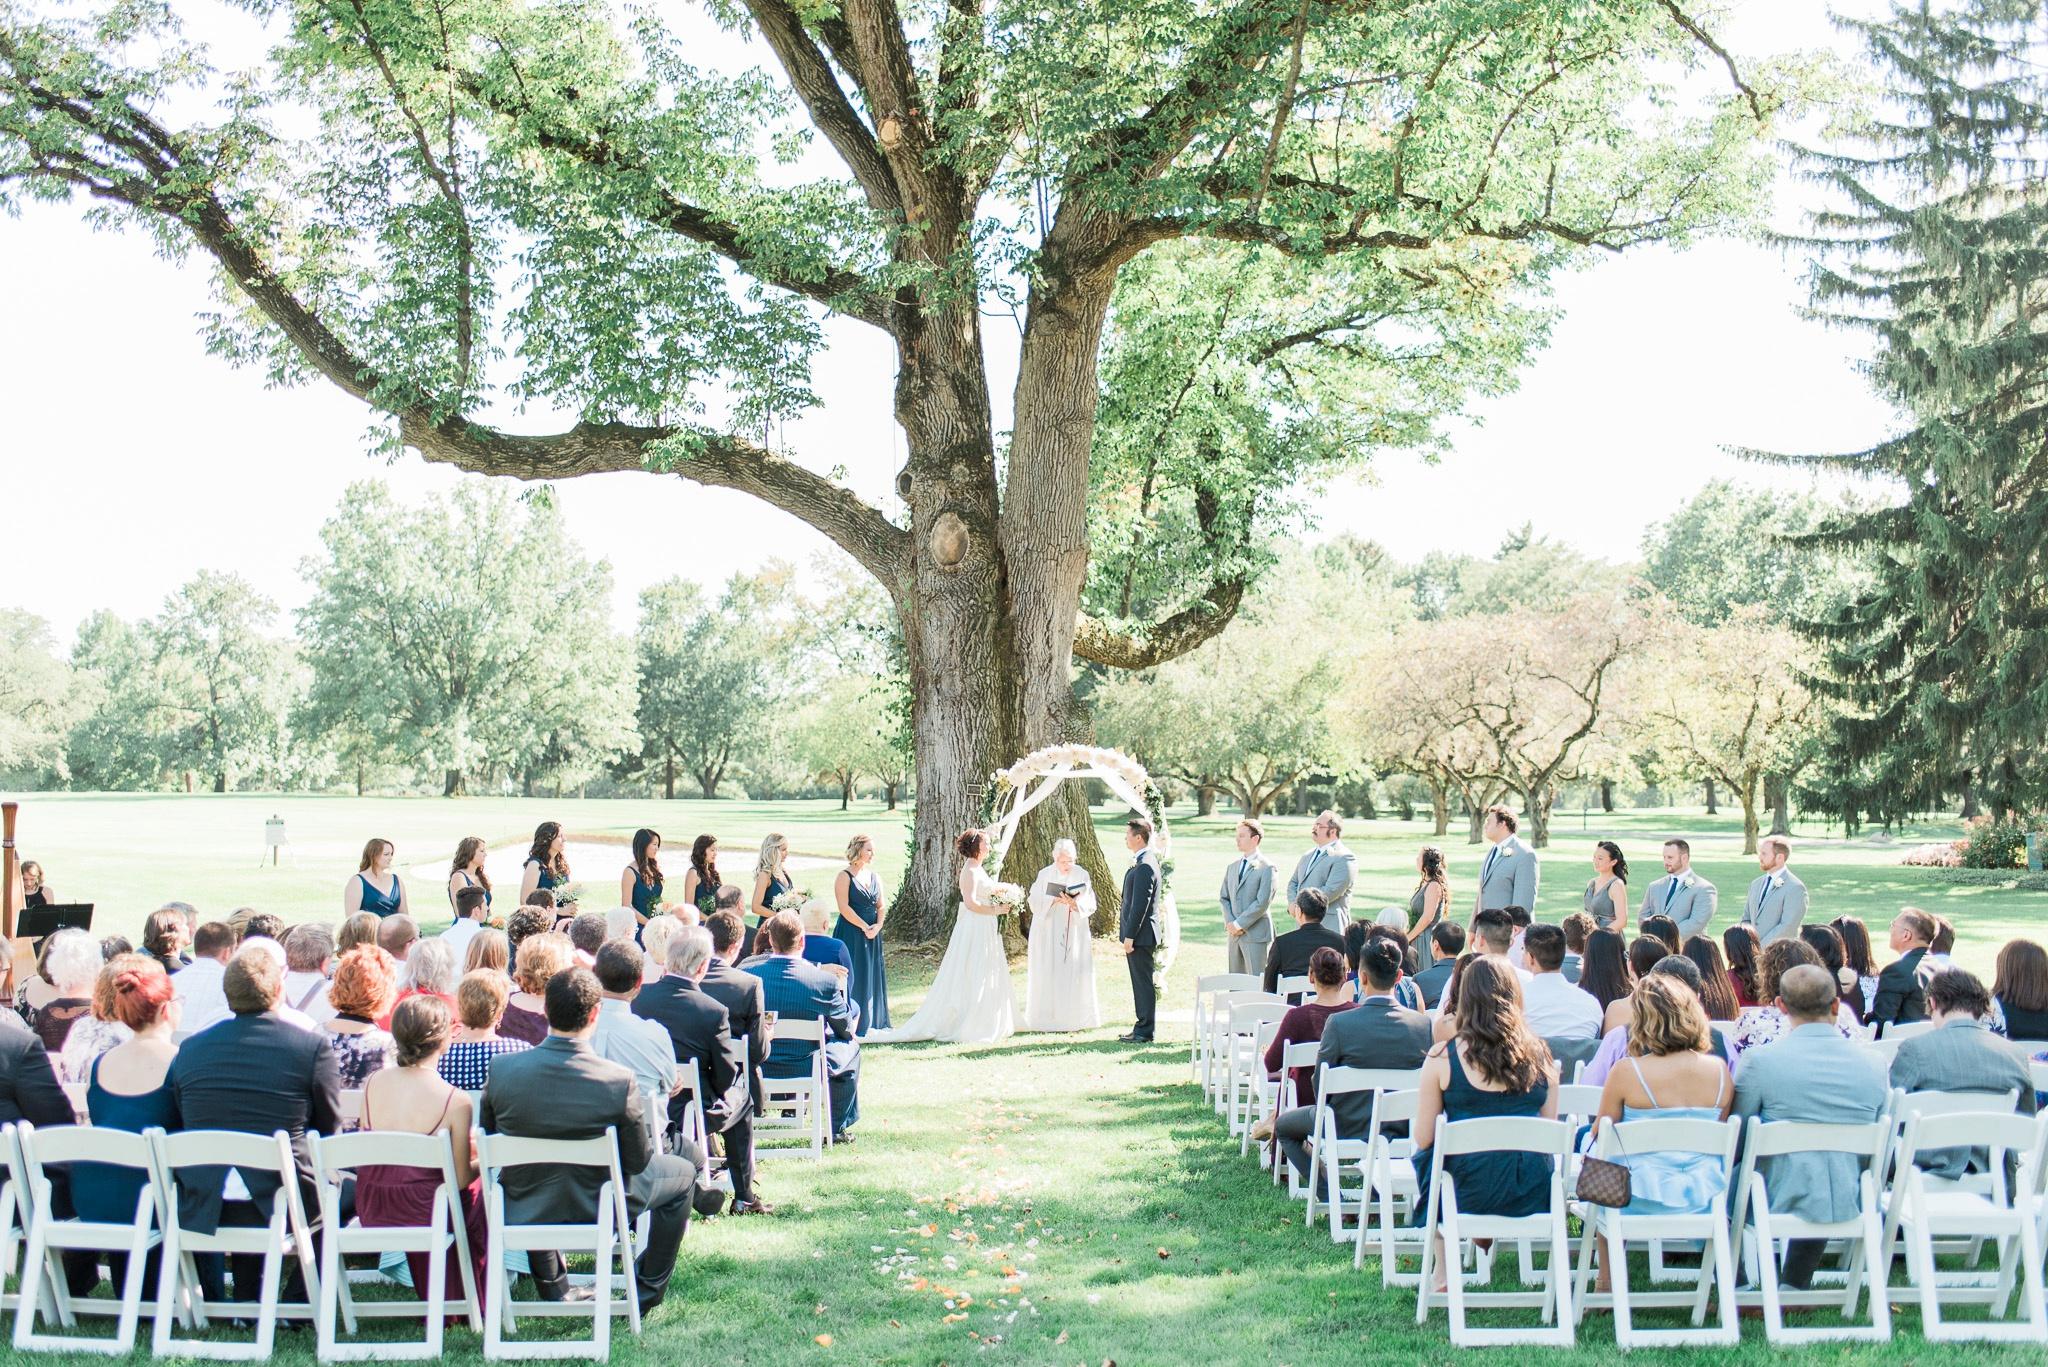 brookside-golf-country-club-wedding-columbus-ohio-63.jpg